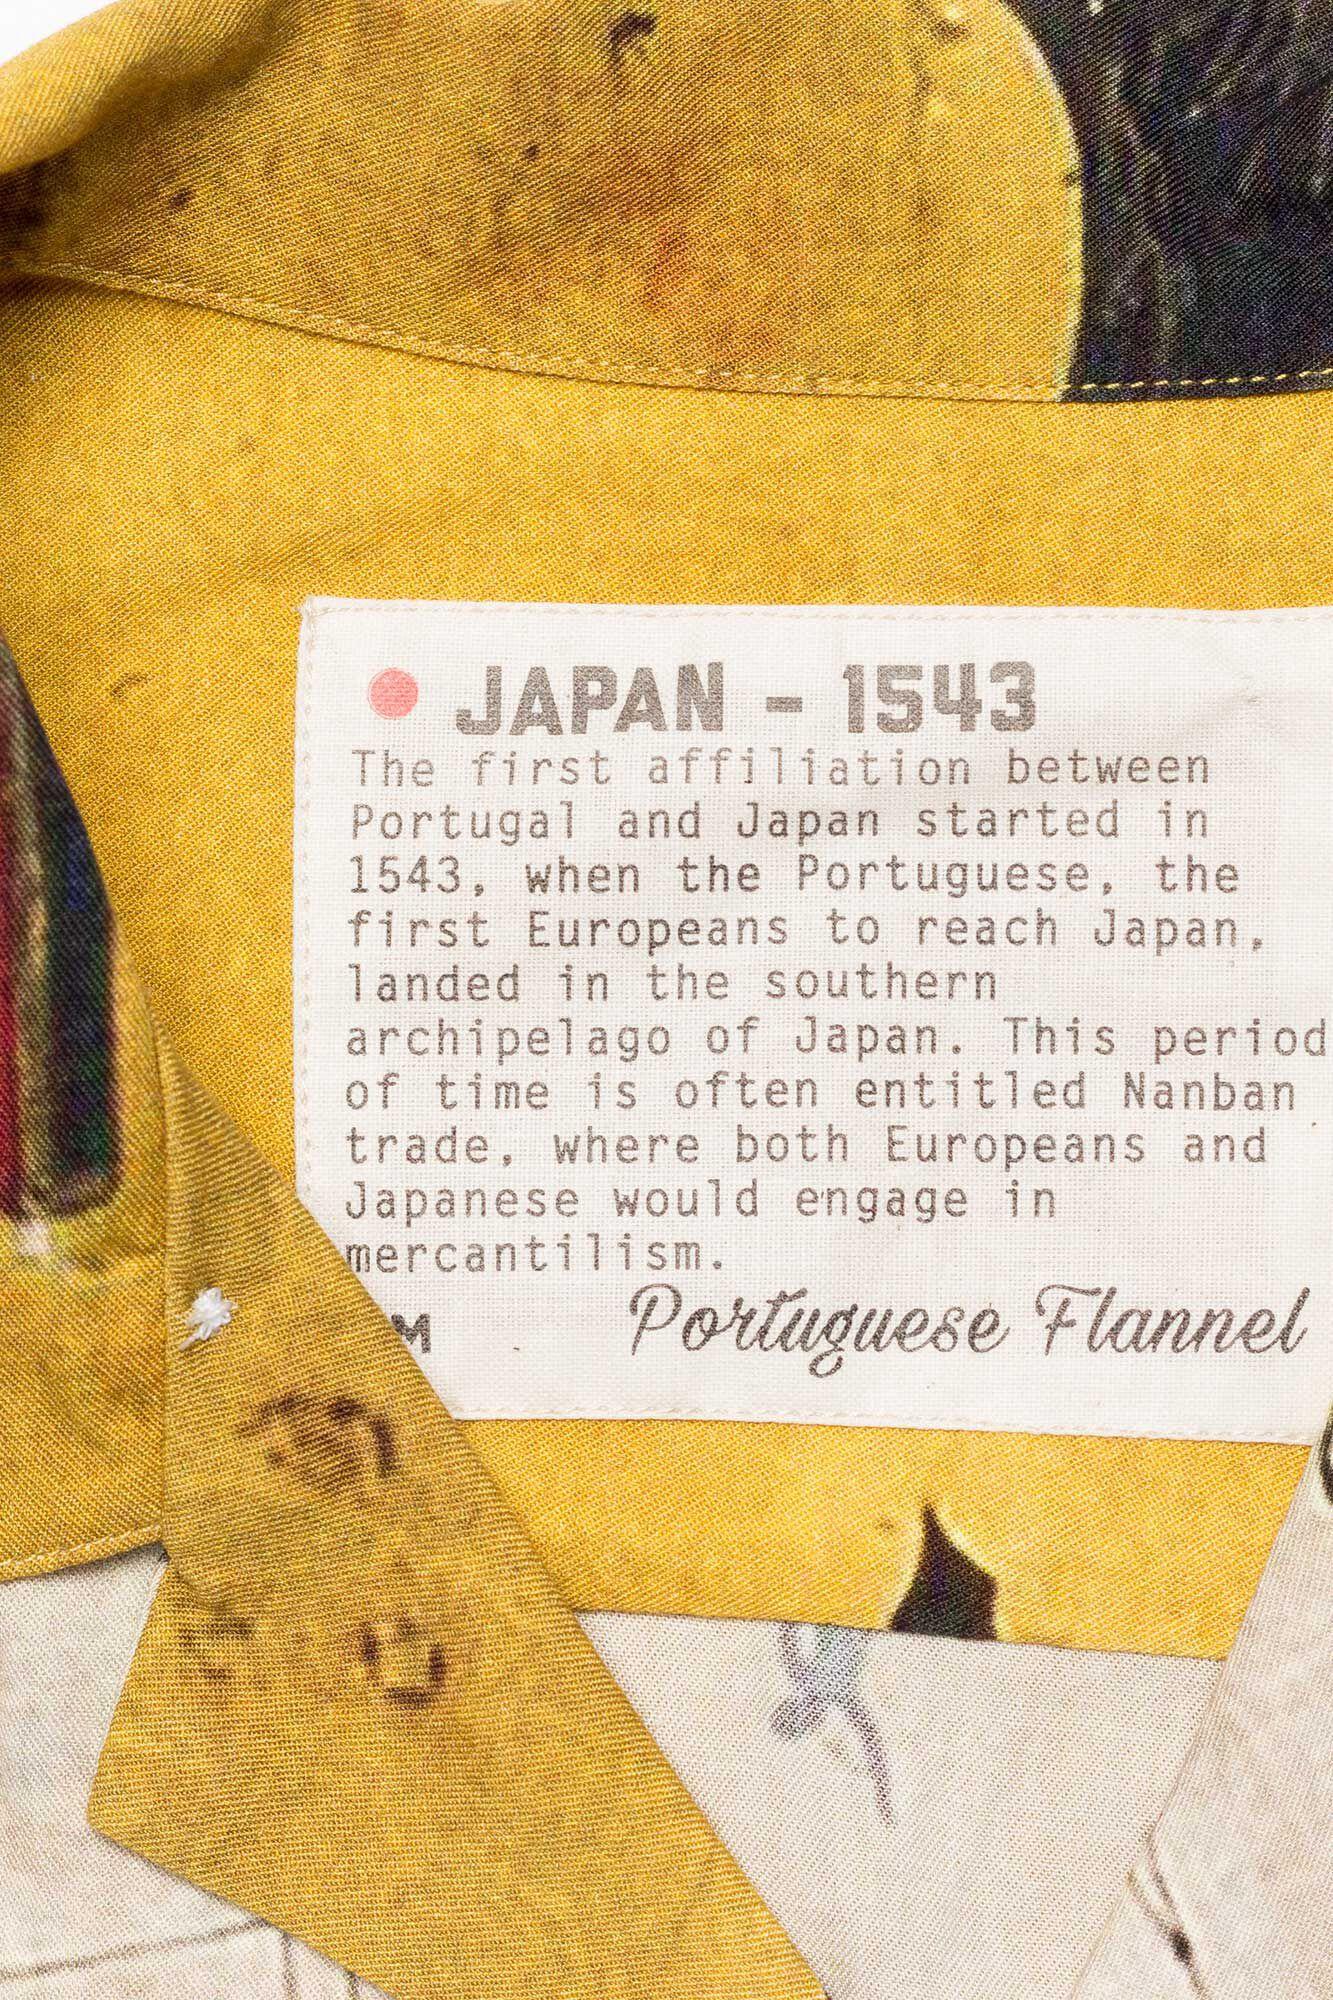 Japan 1543 SS19031.SS